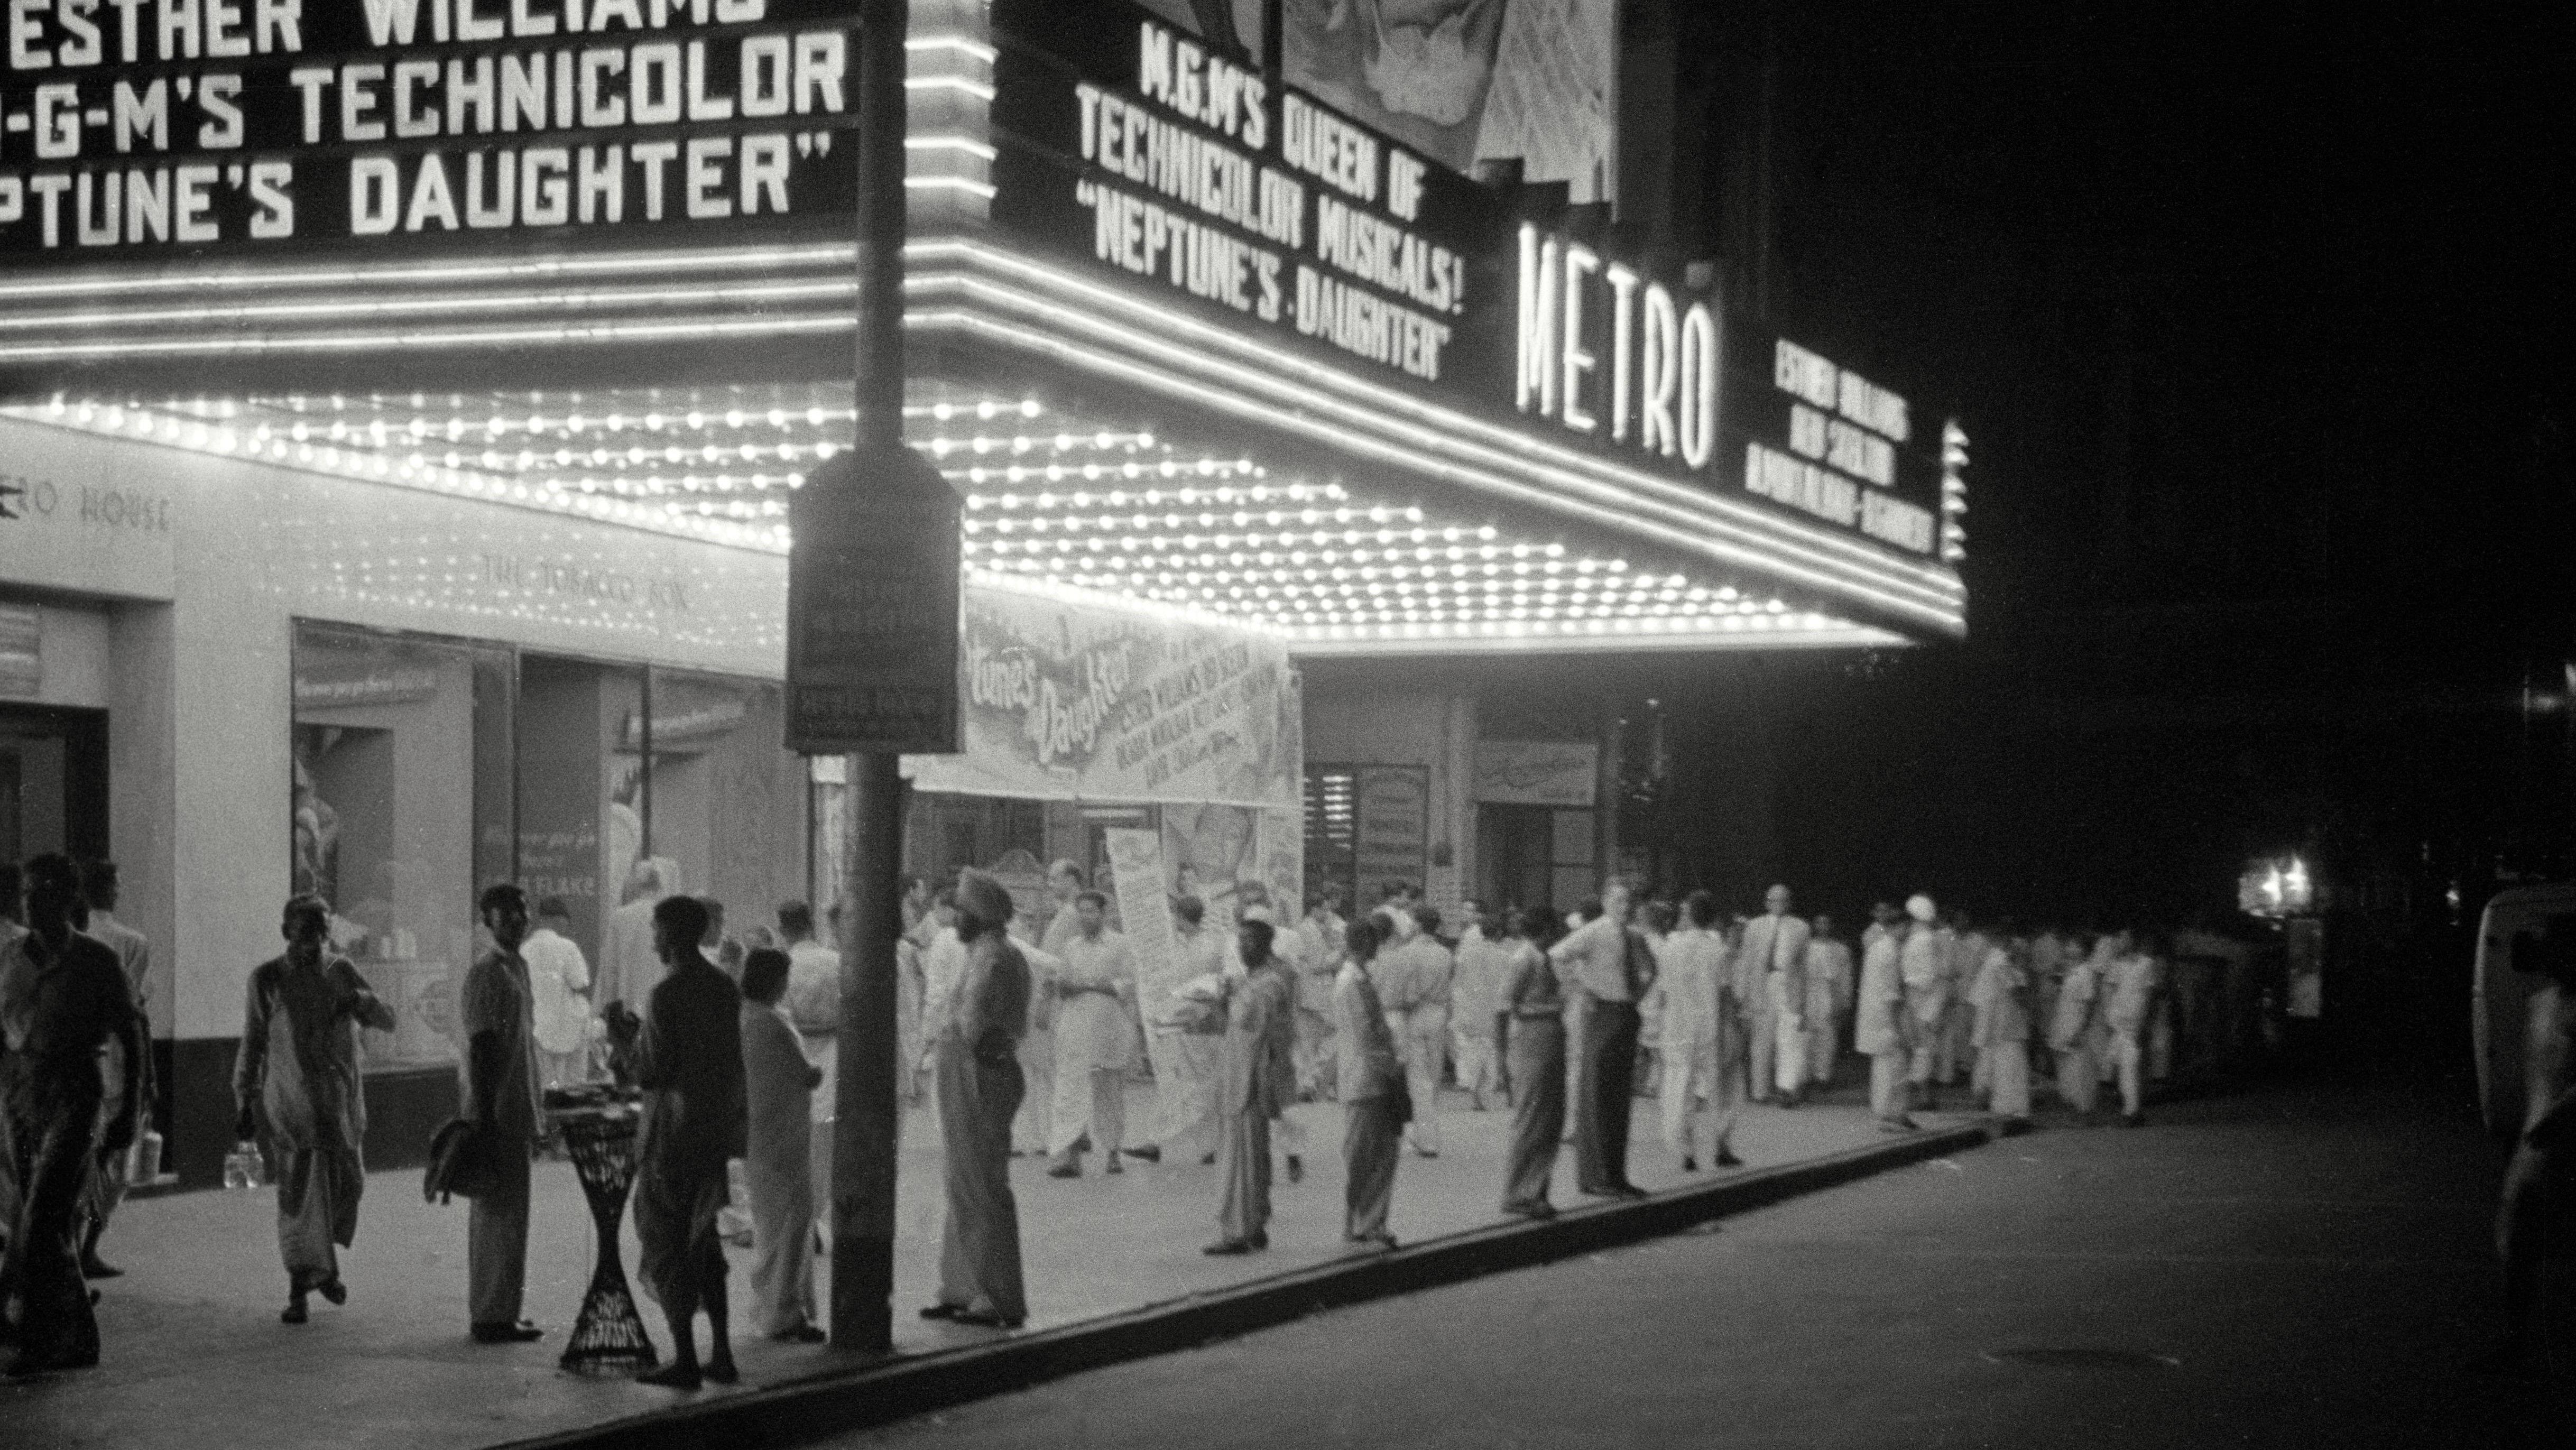 Das Metro Kino in Kalkutta von Architekt: Thomas Lamb -  Eingang bei Nacht